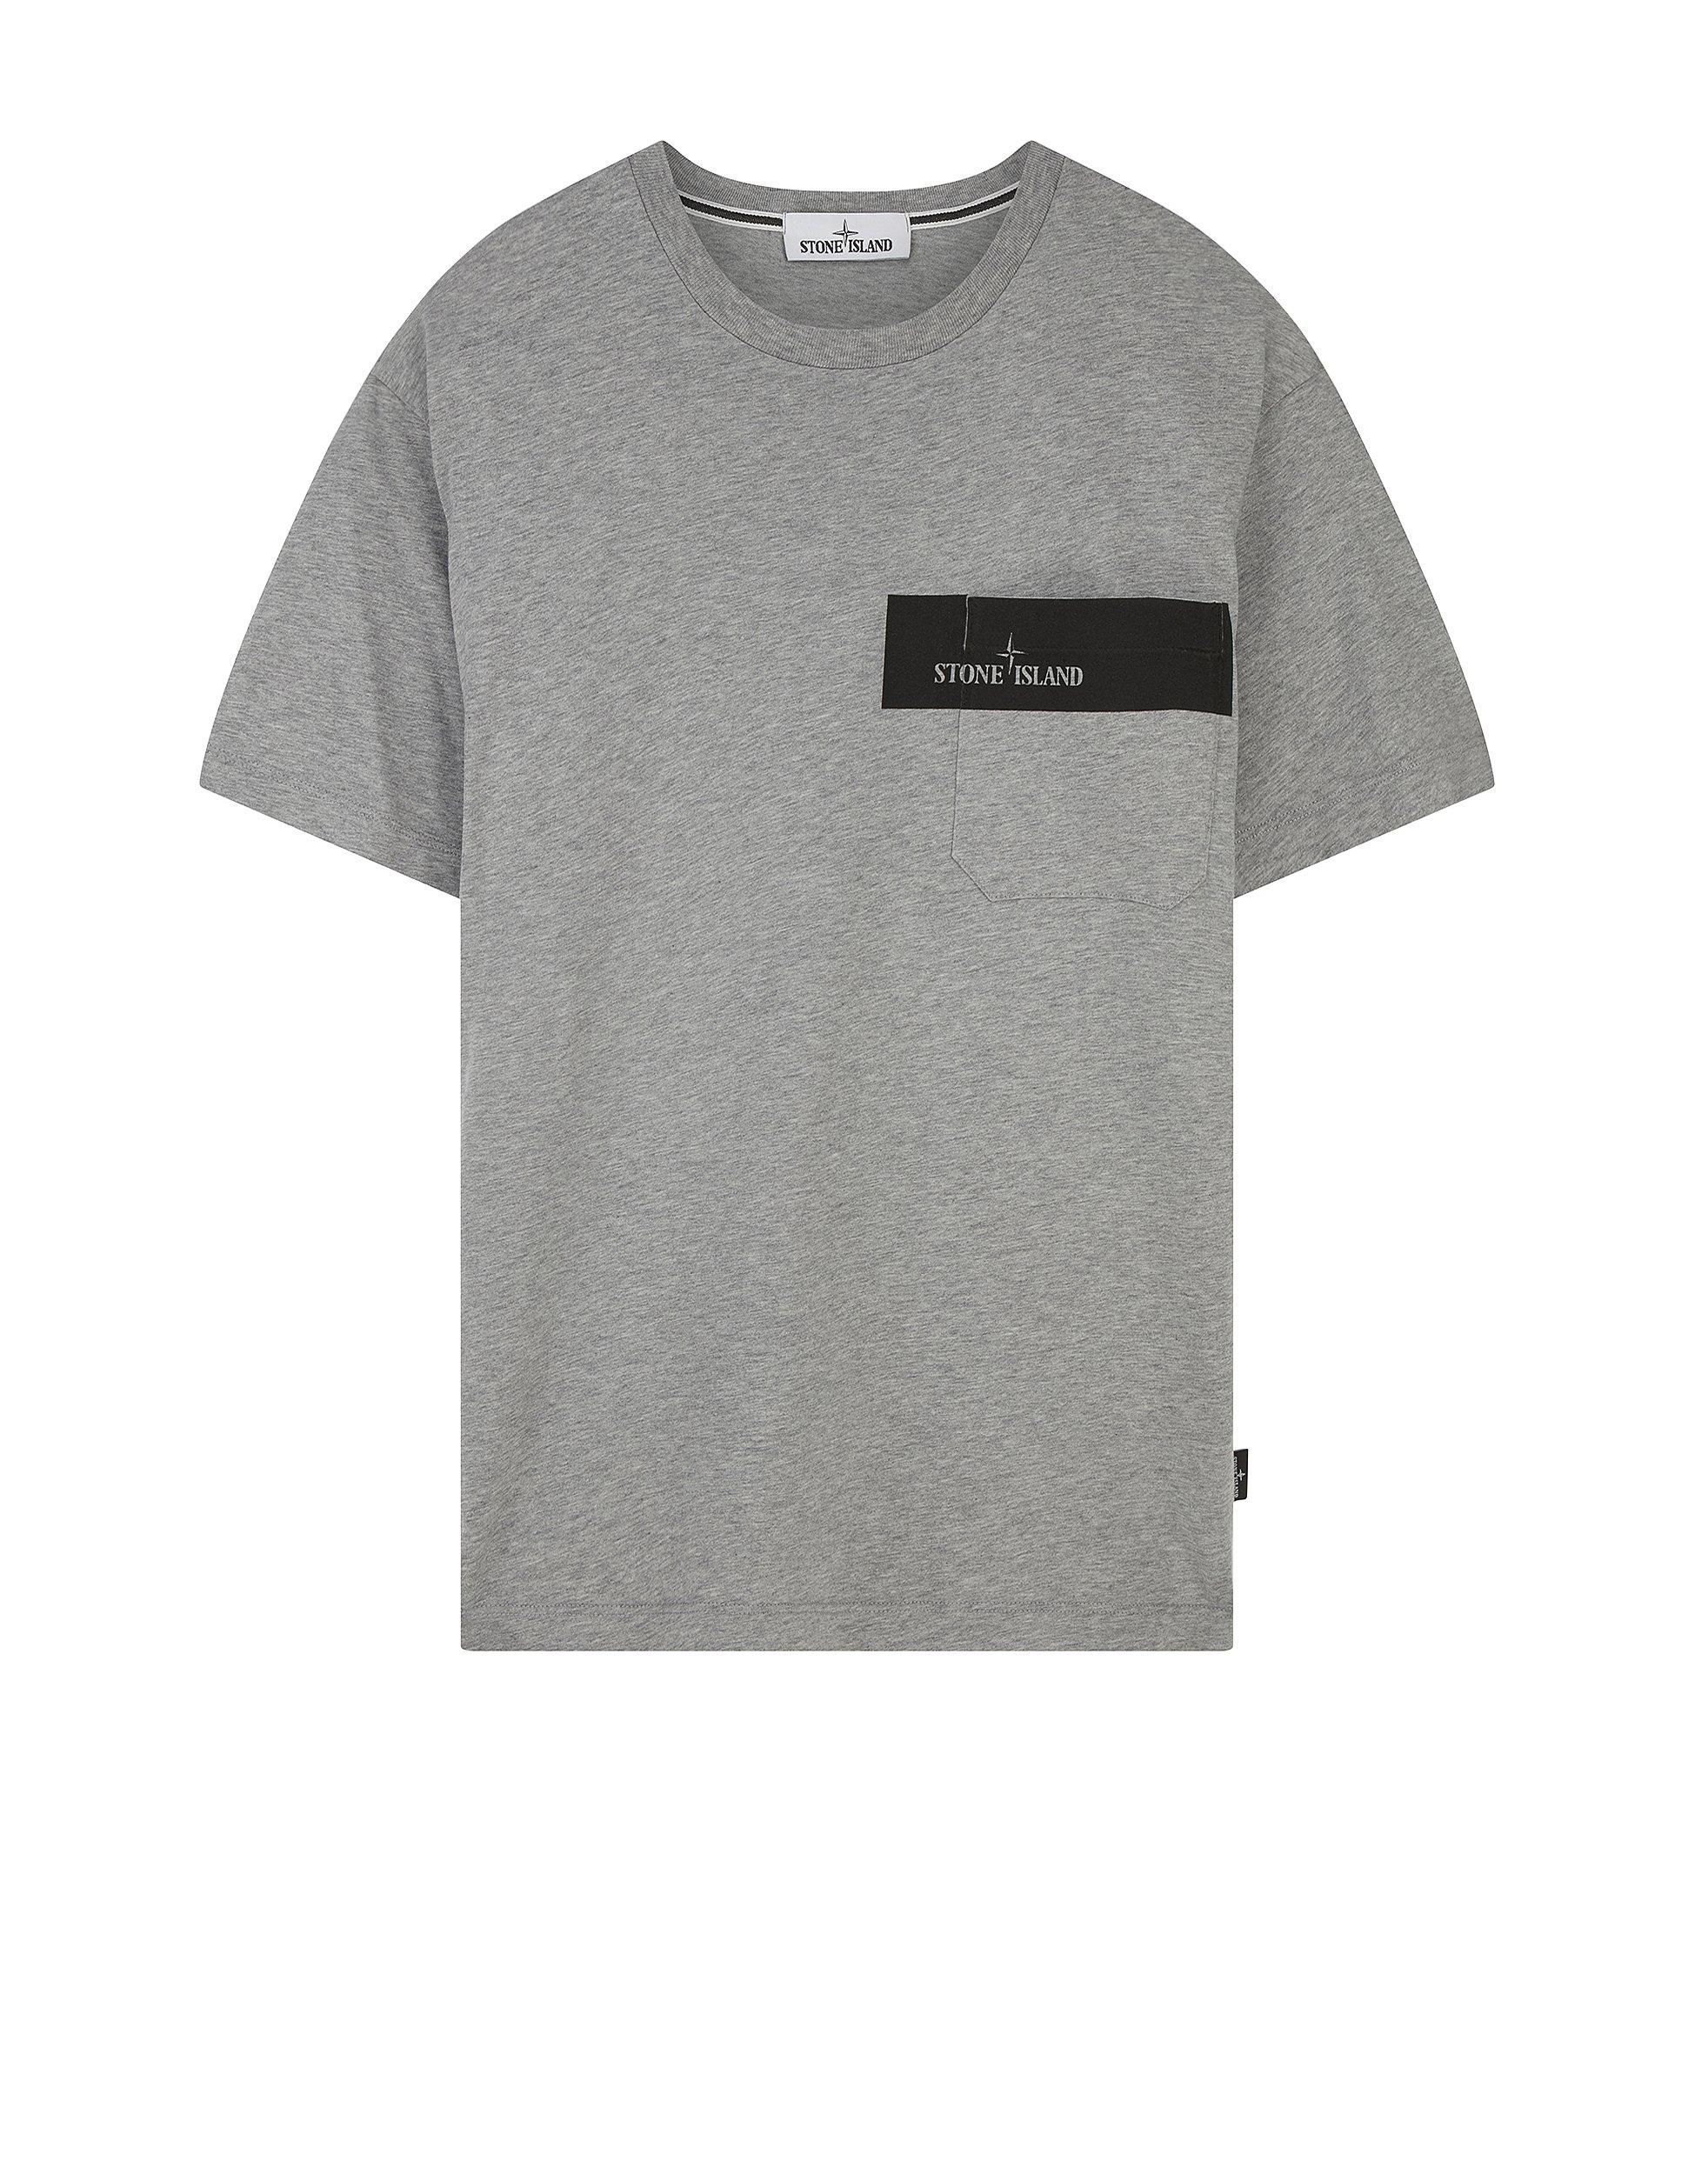 136923721 T-Shirts Stone Island Graphic Eleven T-Shirt 2NS93 Navy